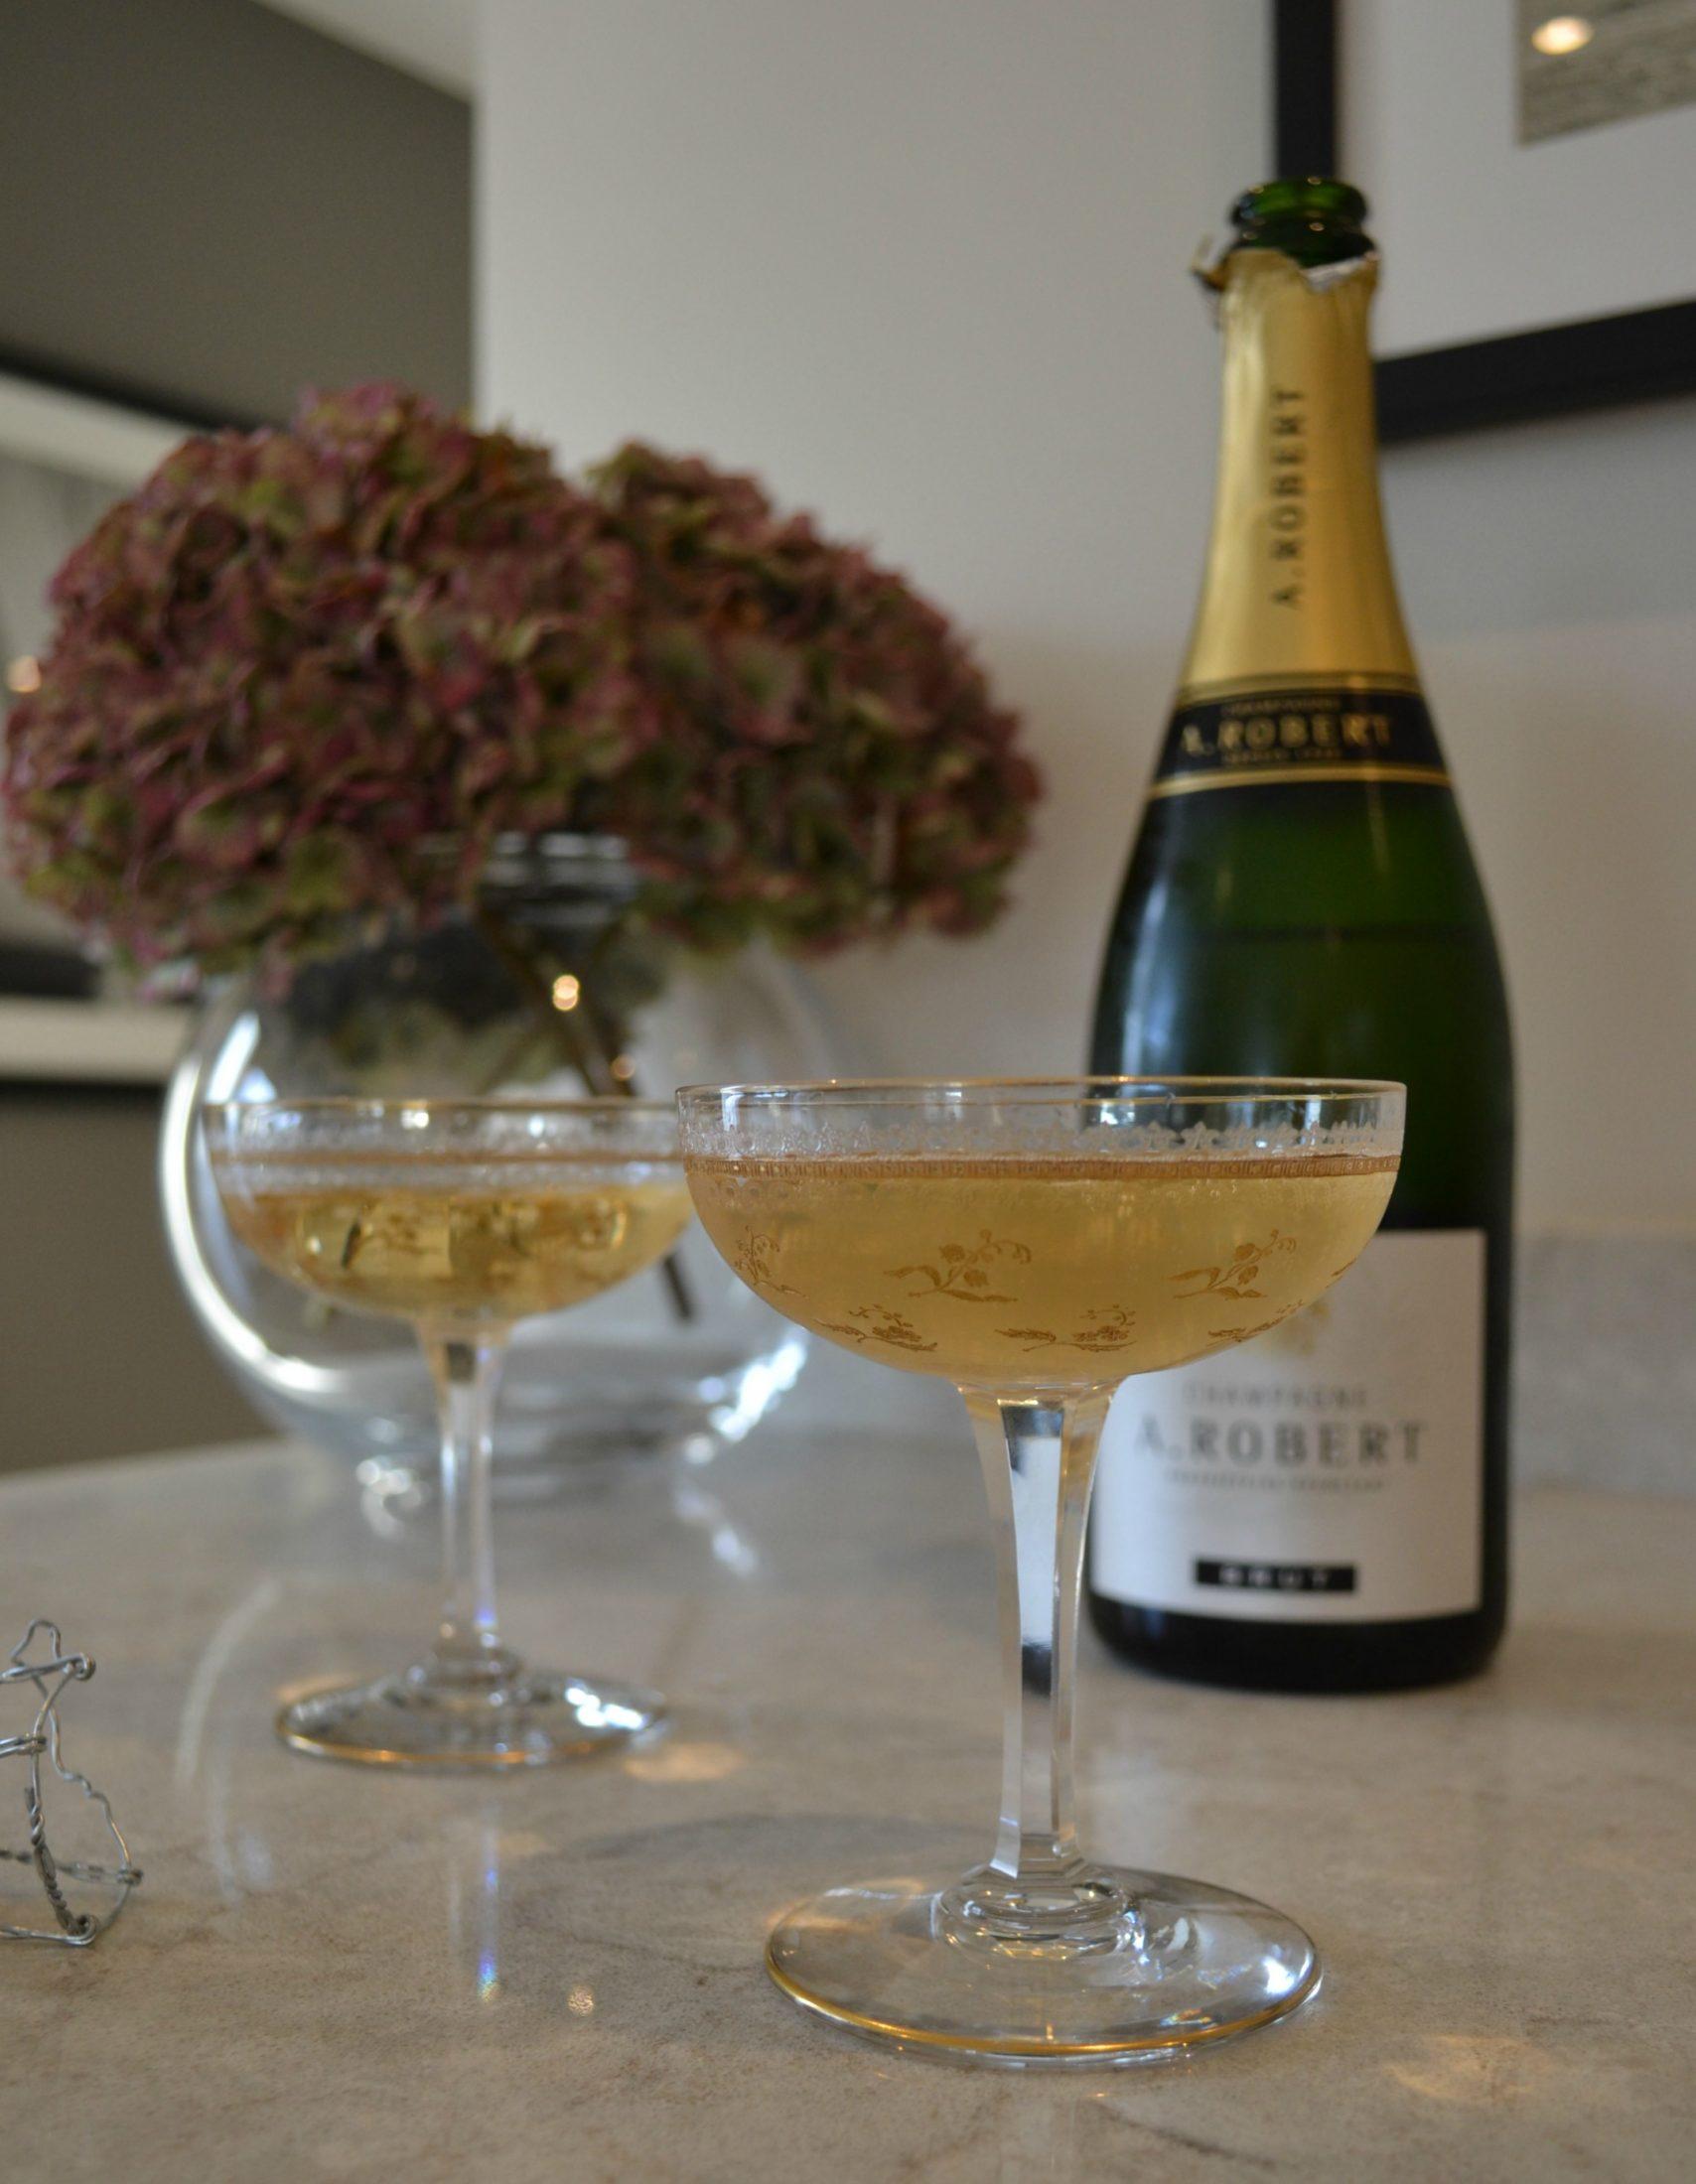 Champagne A. Robert - Perfect Festive Fizz - Humphrey Munson Blog 6